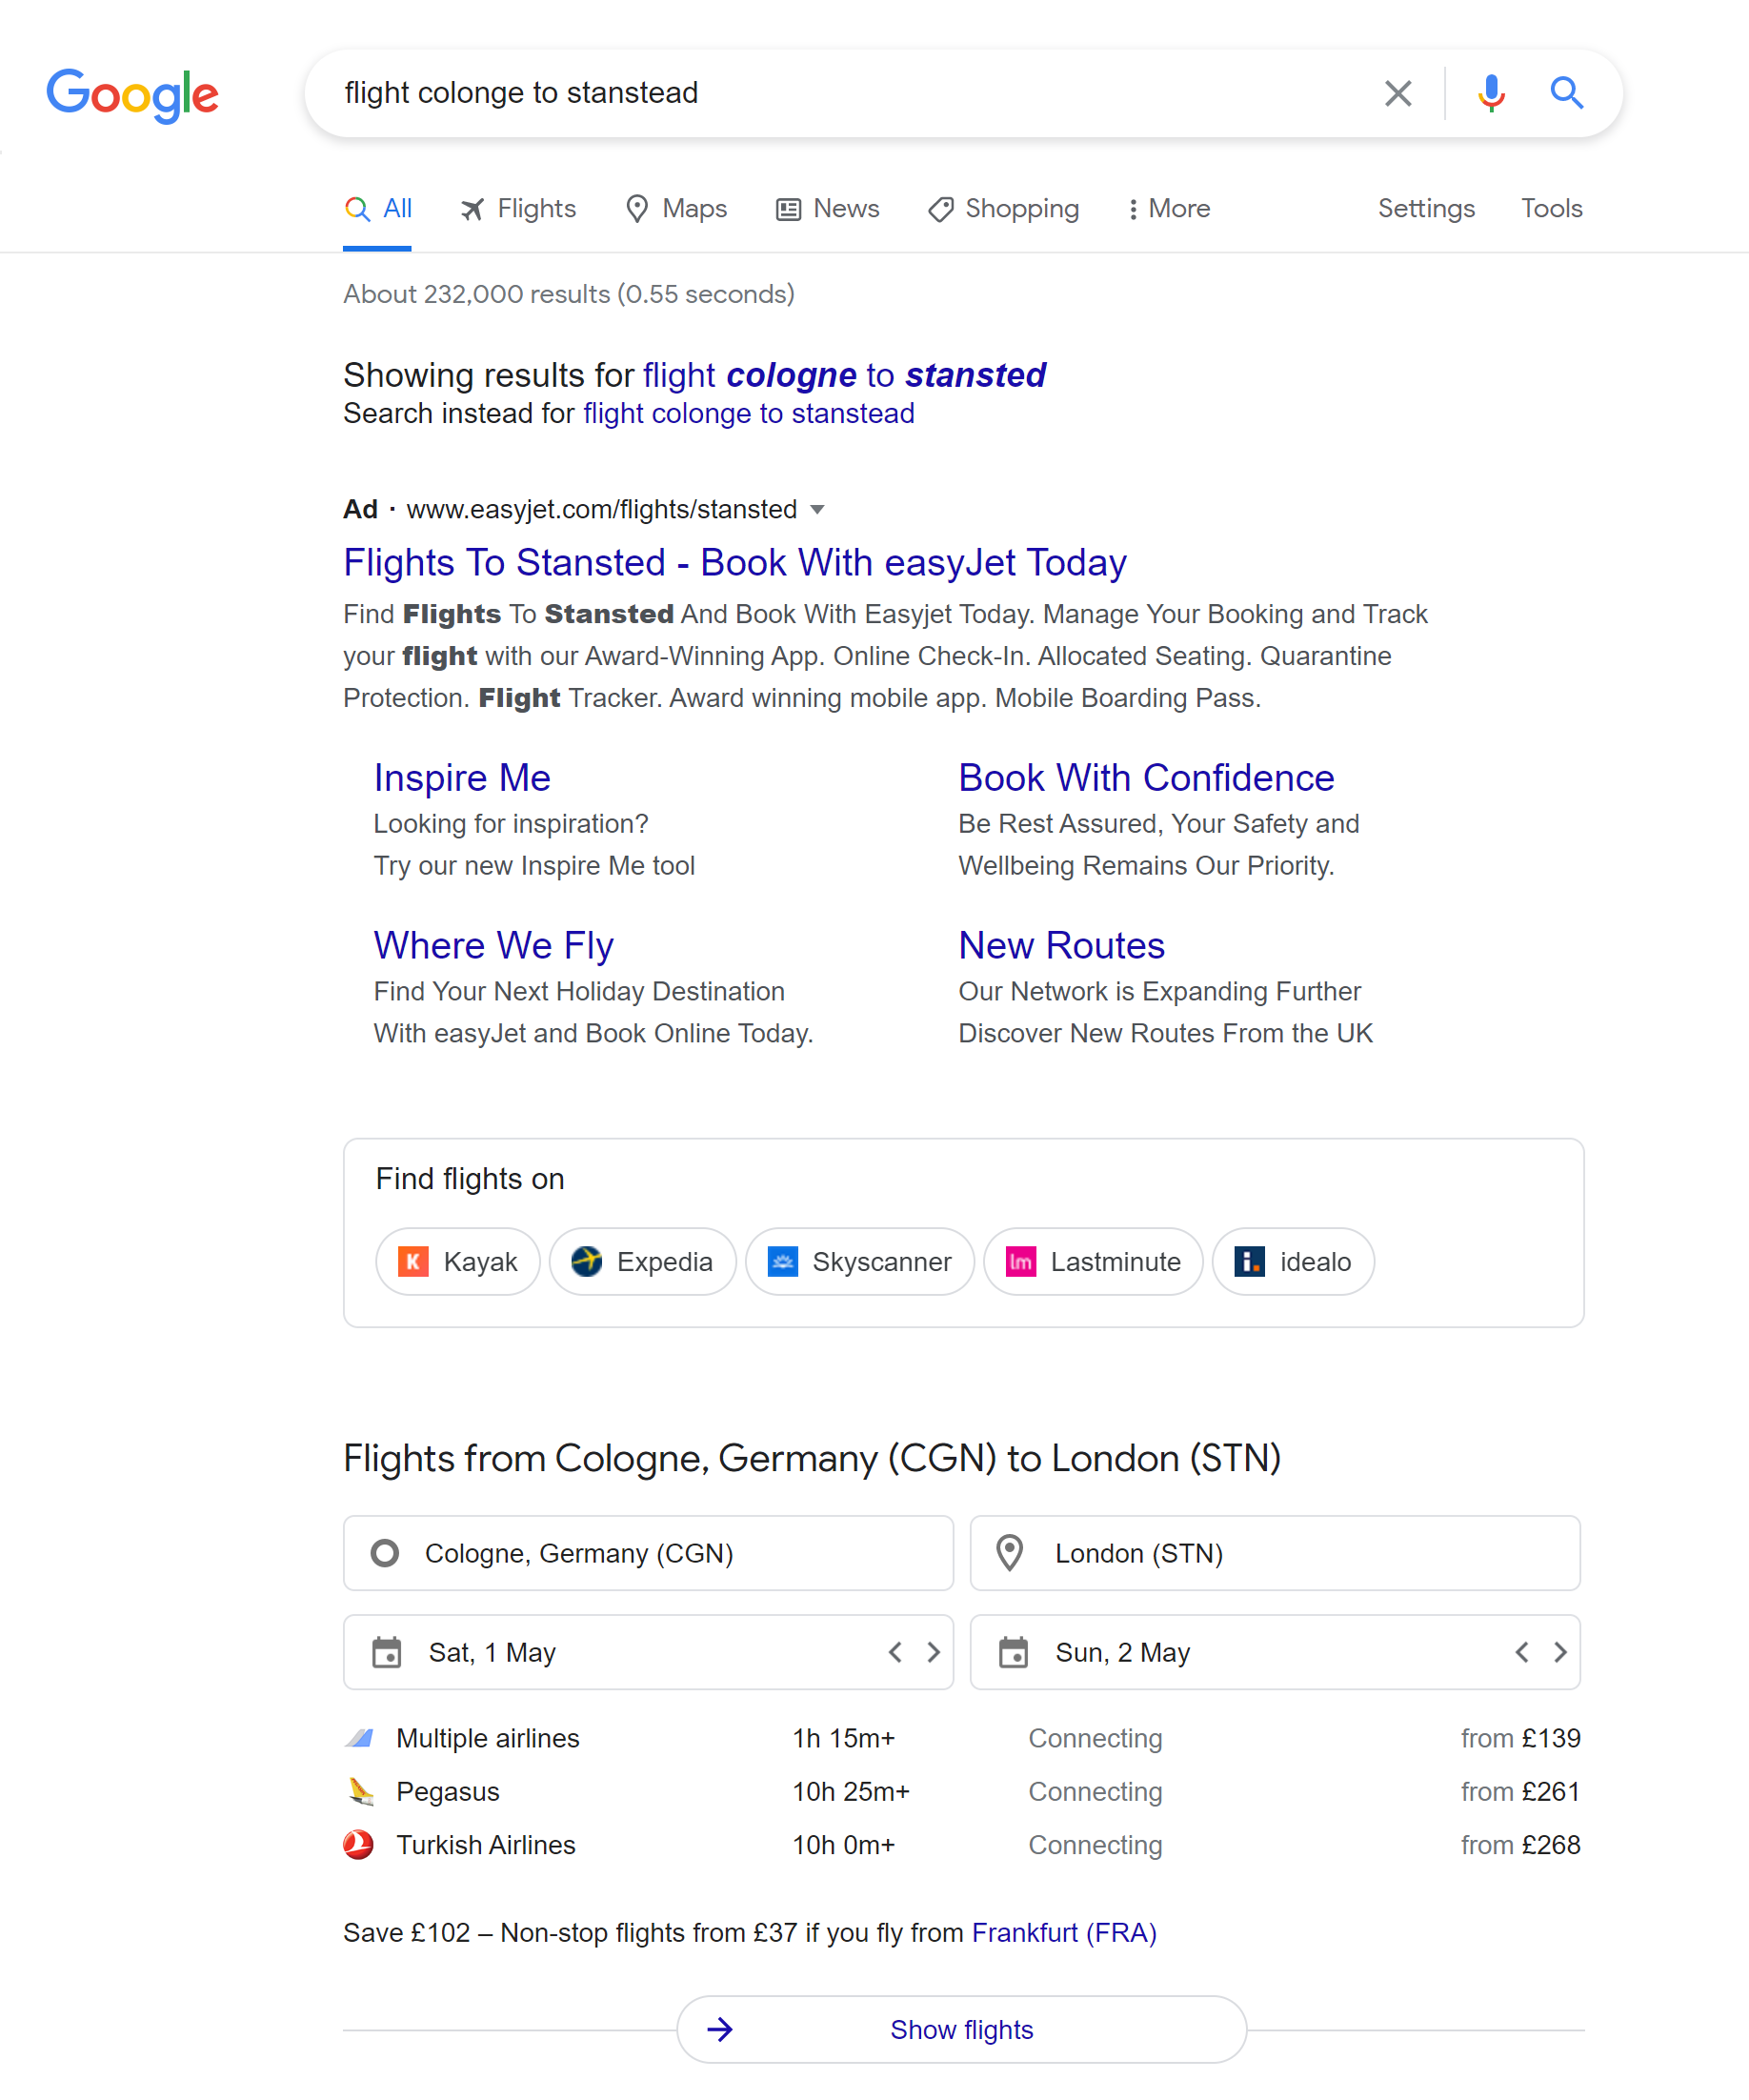 Google's flight search feature